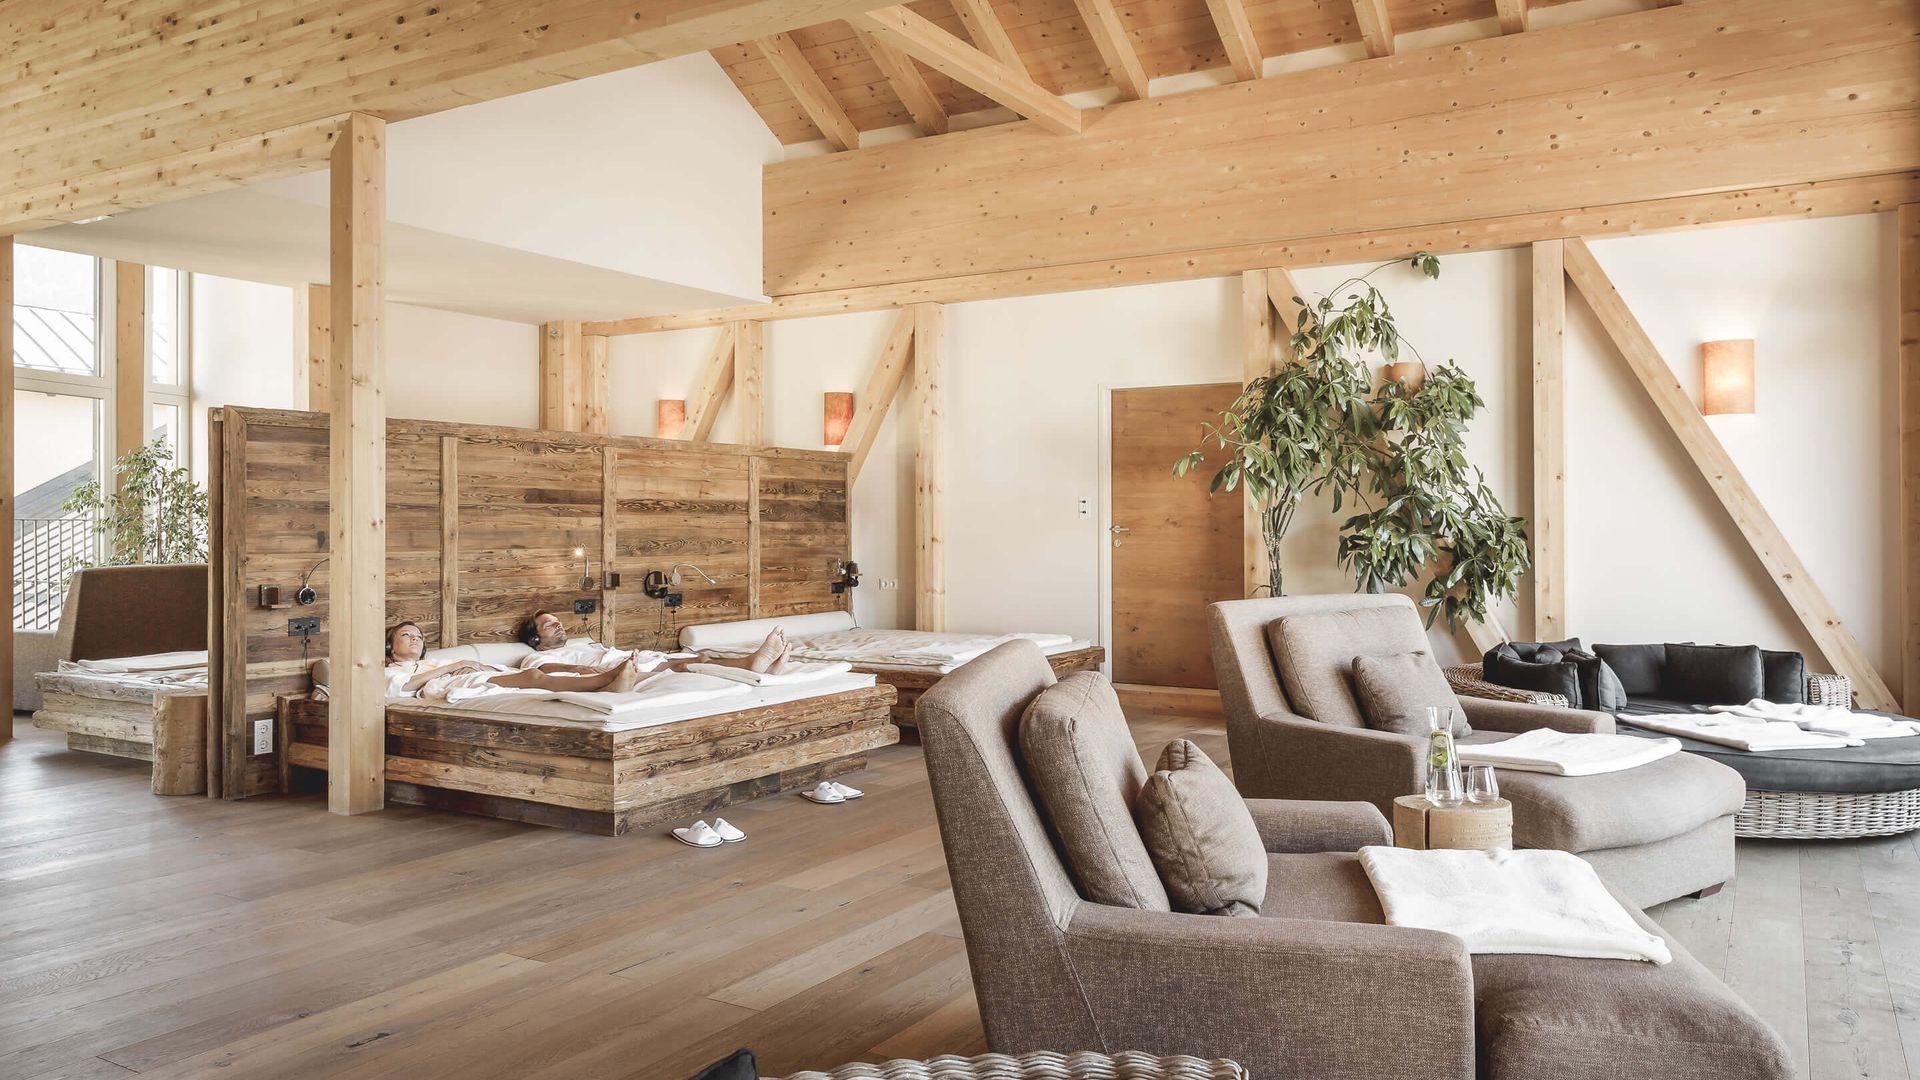 Ihr Wellnesshotel in Seefeld: Krumers Post Hotel & Spa